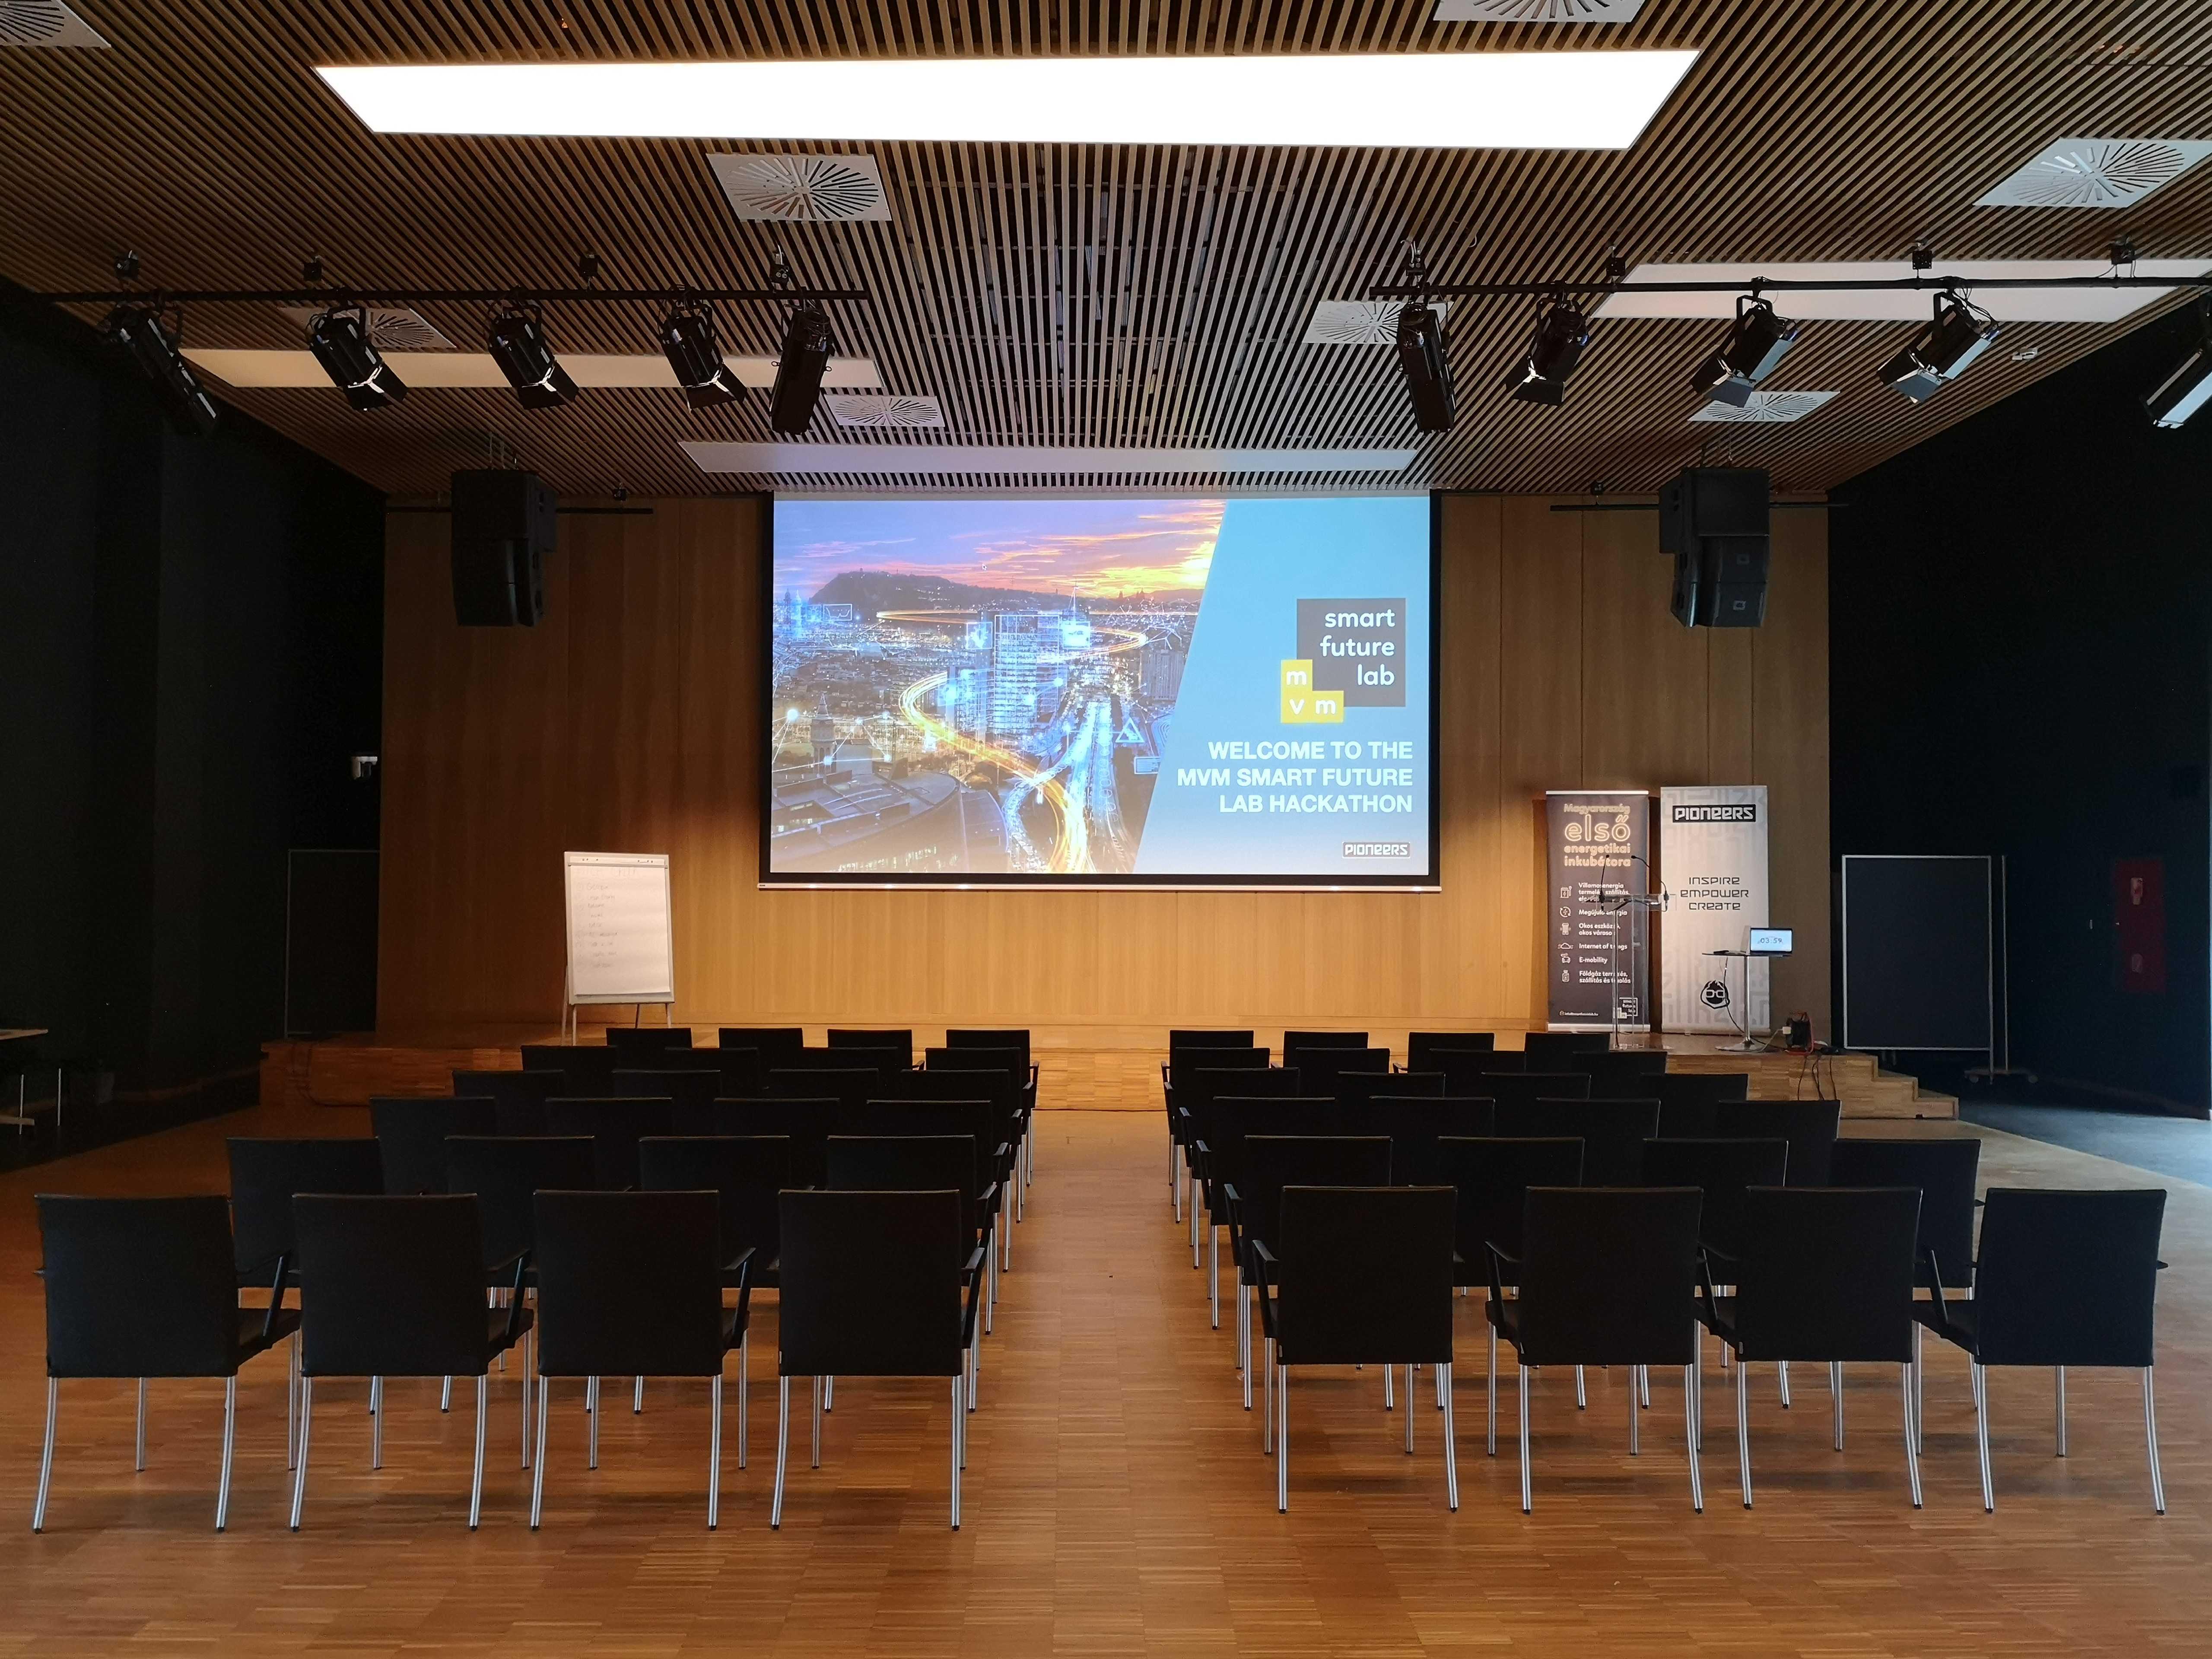 2019 10 09 Smart Future Lab Hackathon Budapest 2